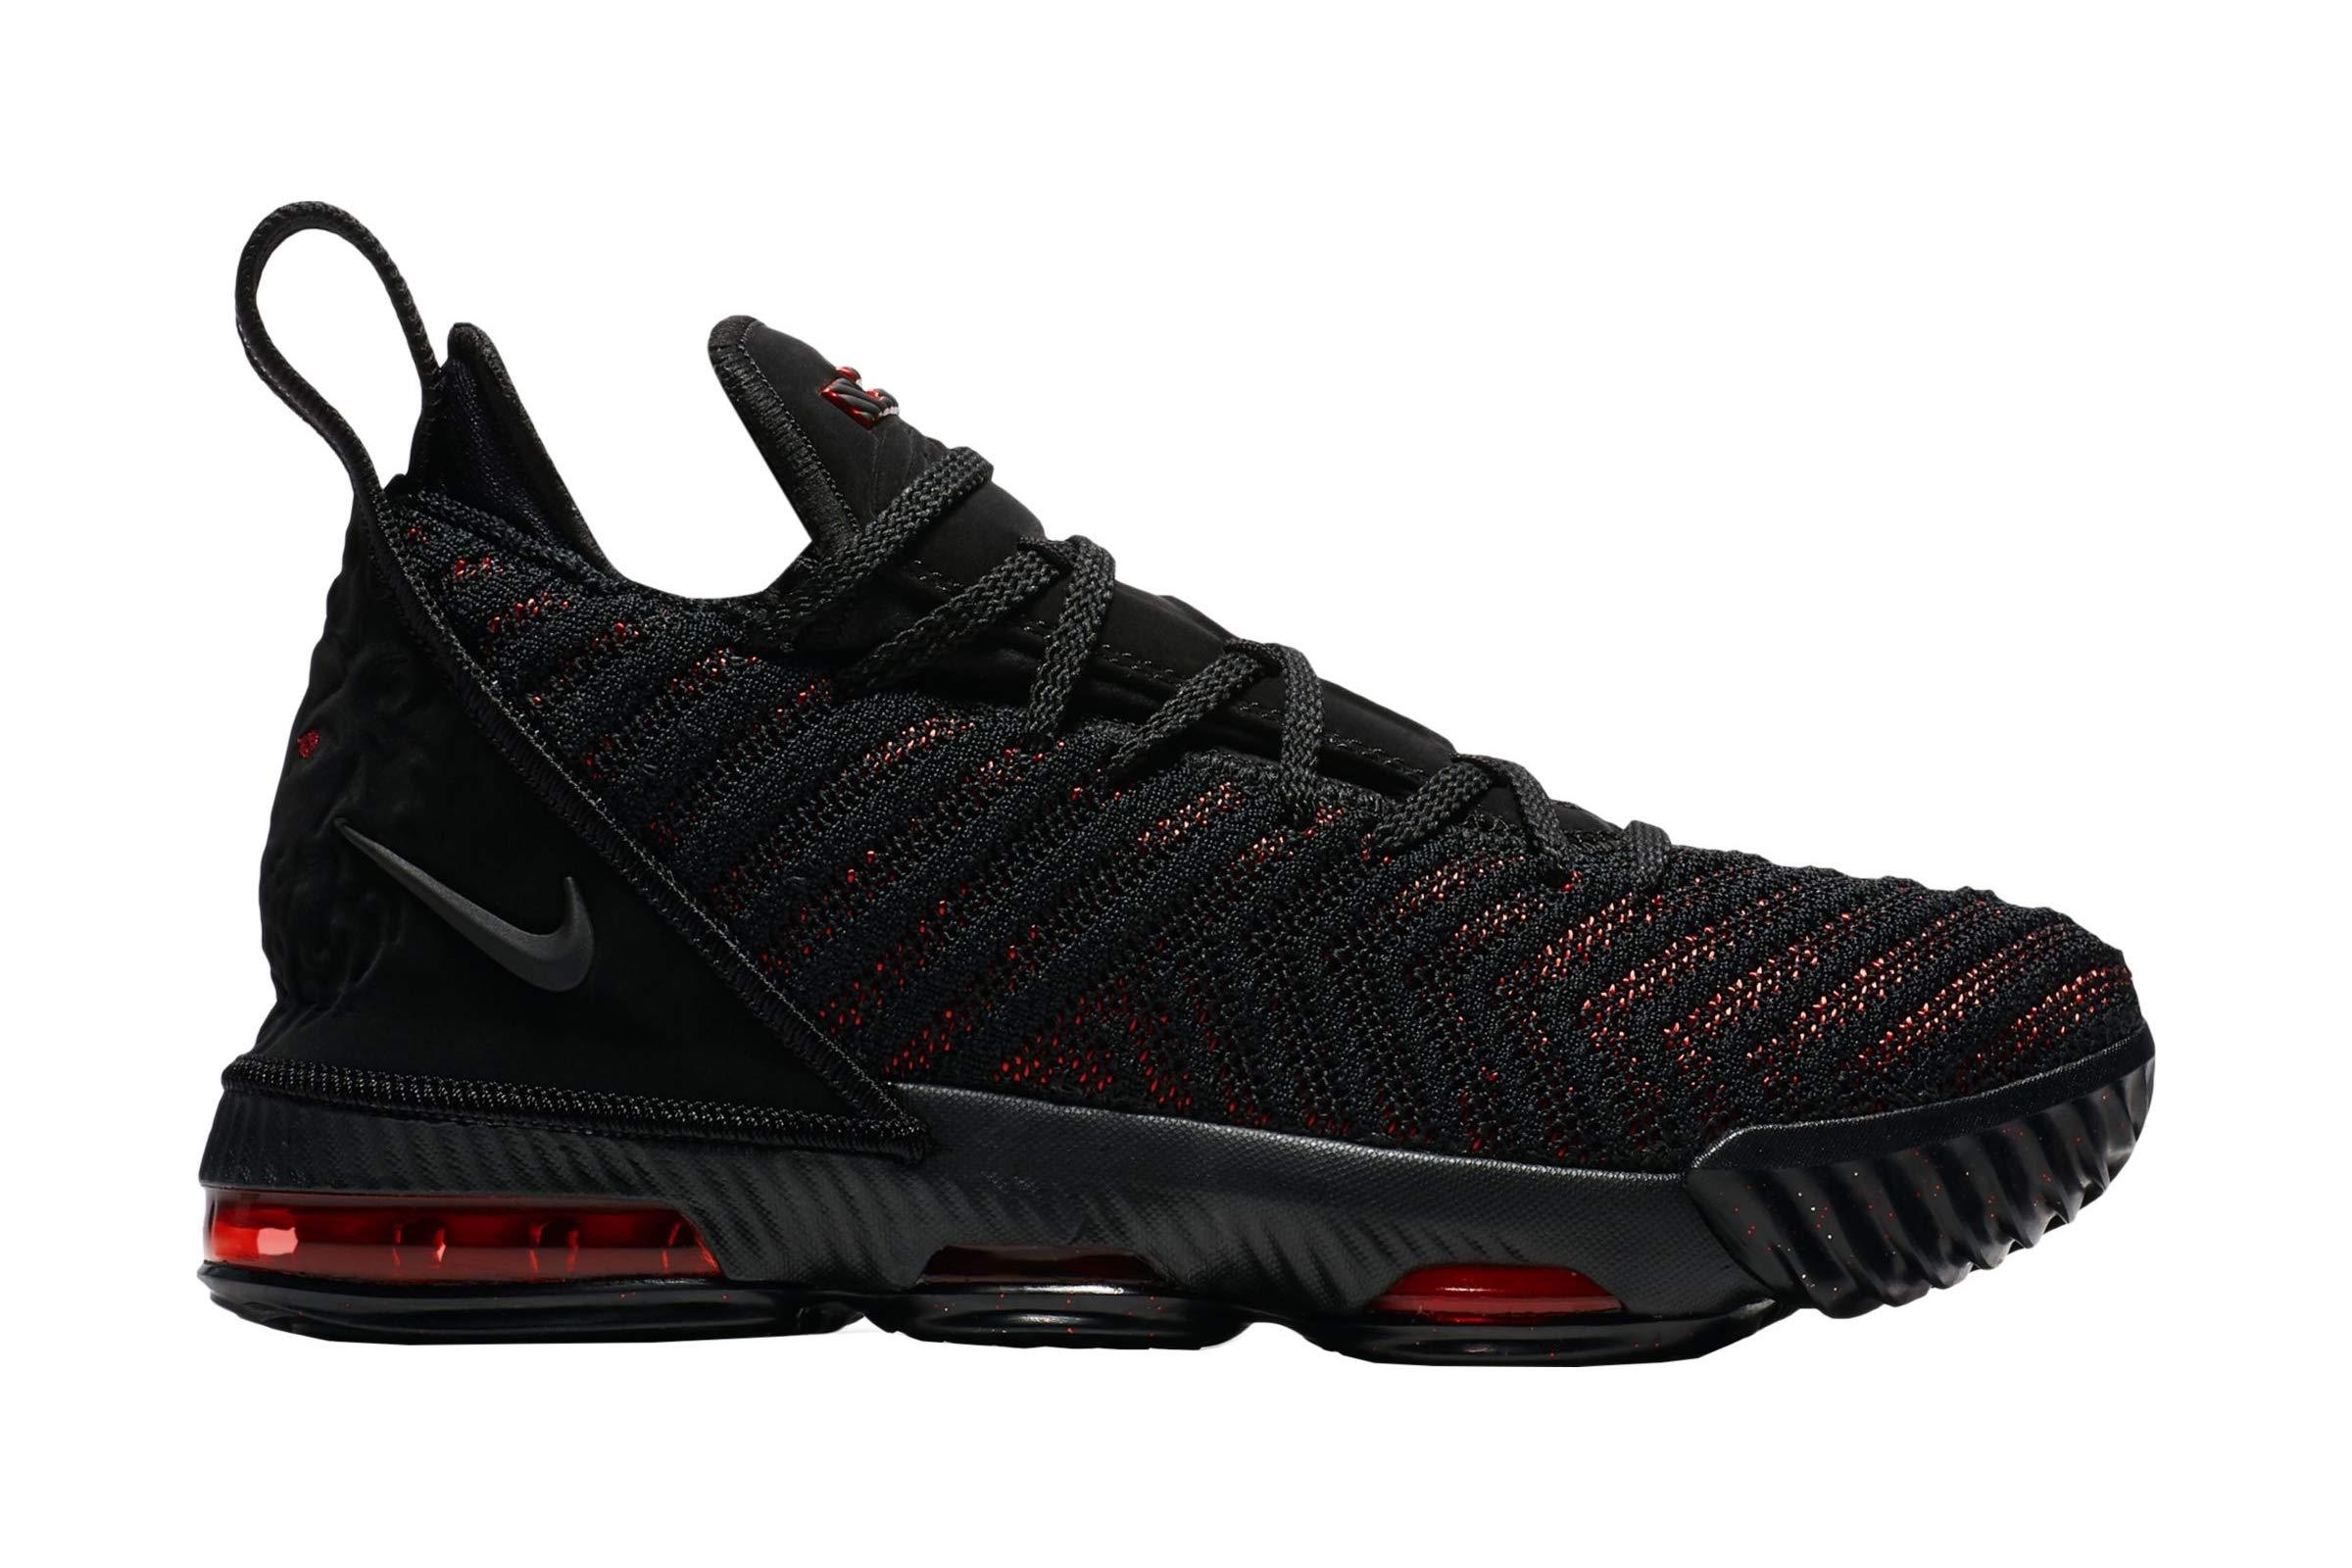 Nike Kids Lebron XVI GS, Black/Black-University RED, Youth Size 7 by Nike